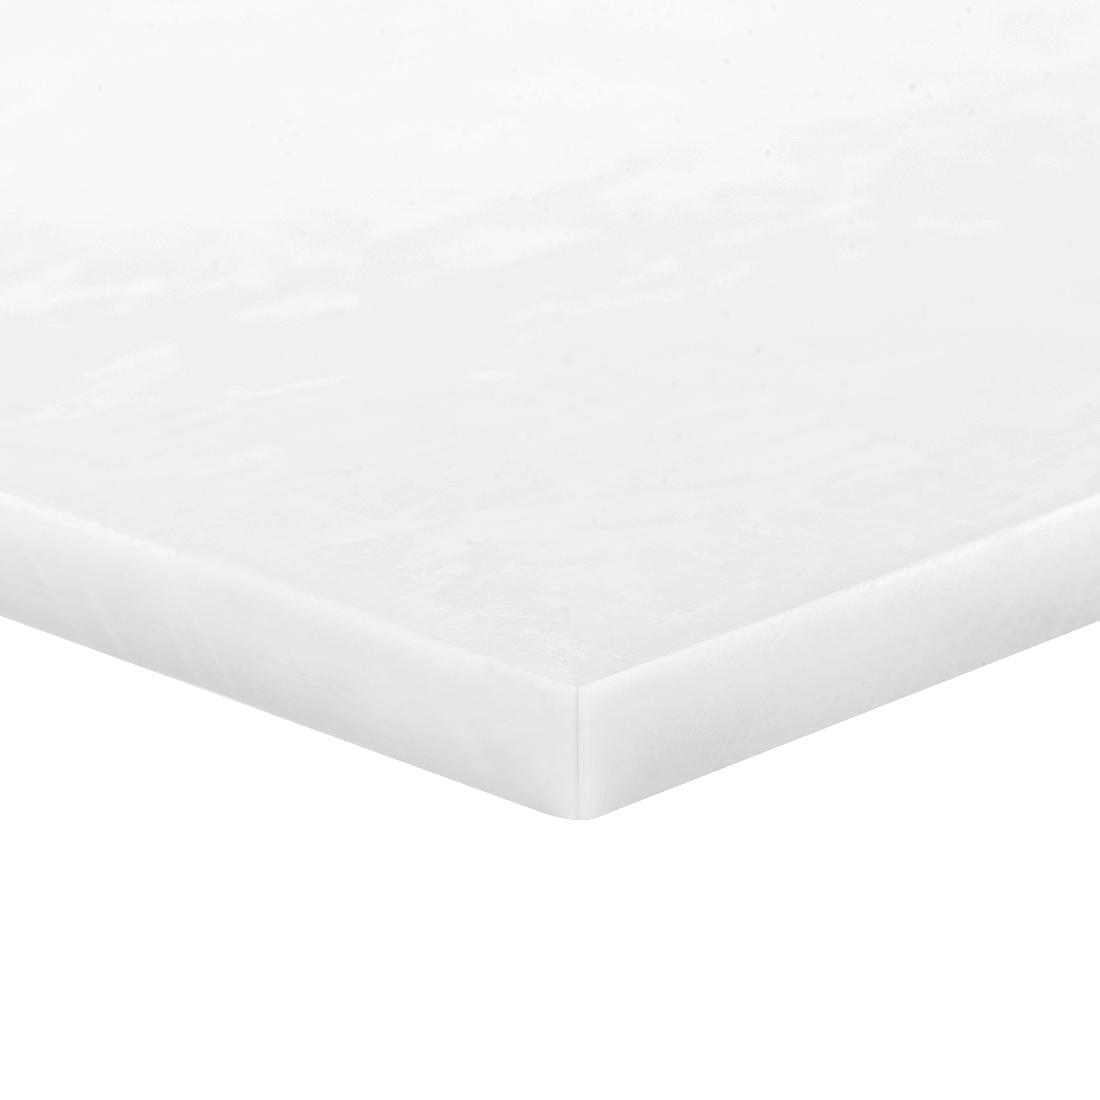 Acetal POM Sheet Polyoxymethylene Plate Sheet 300 x 200 x 5mm White